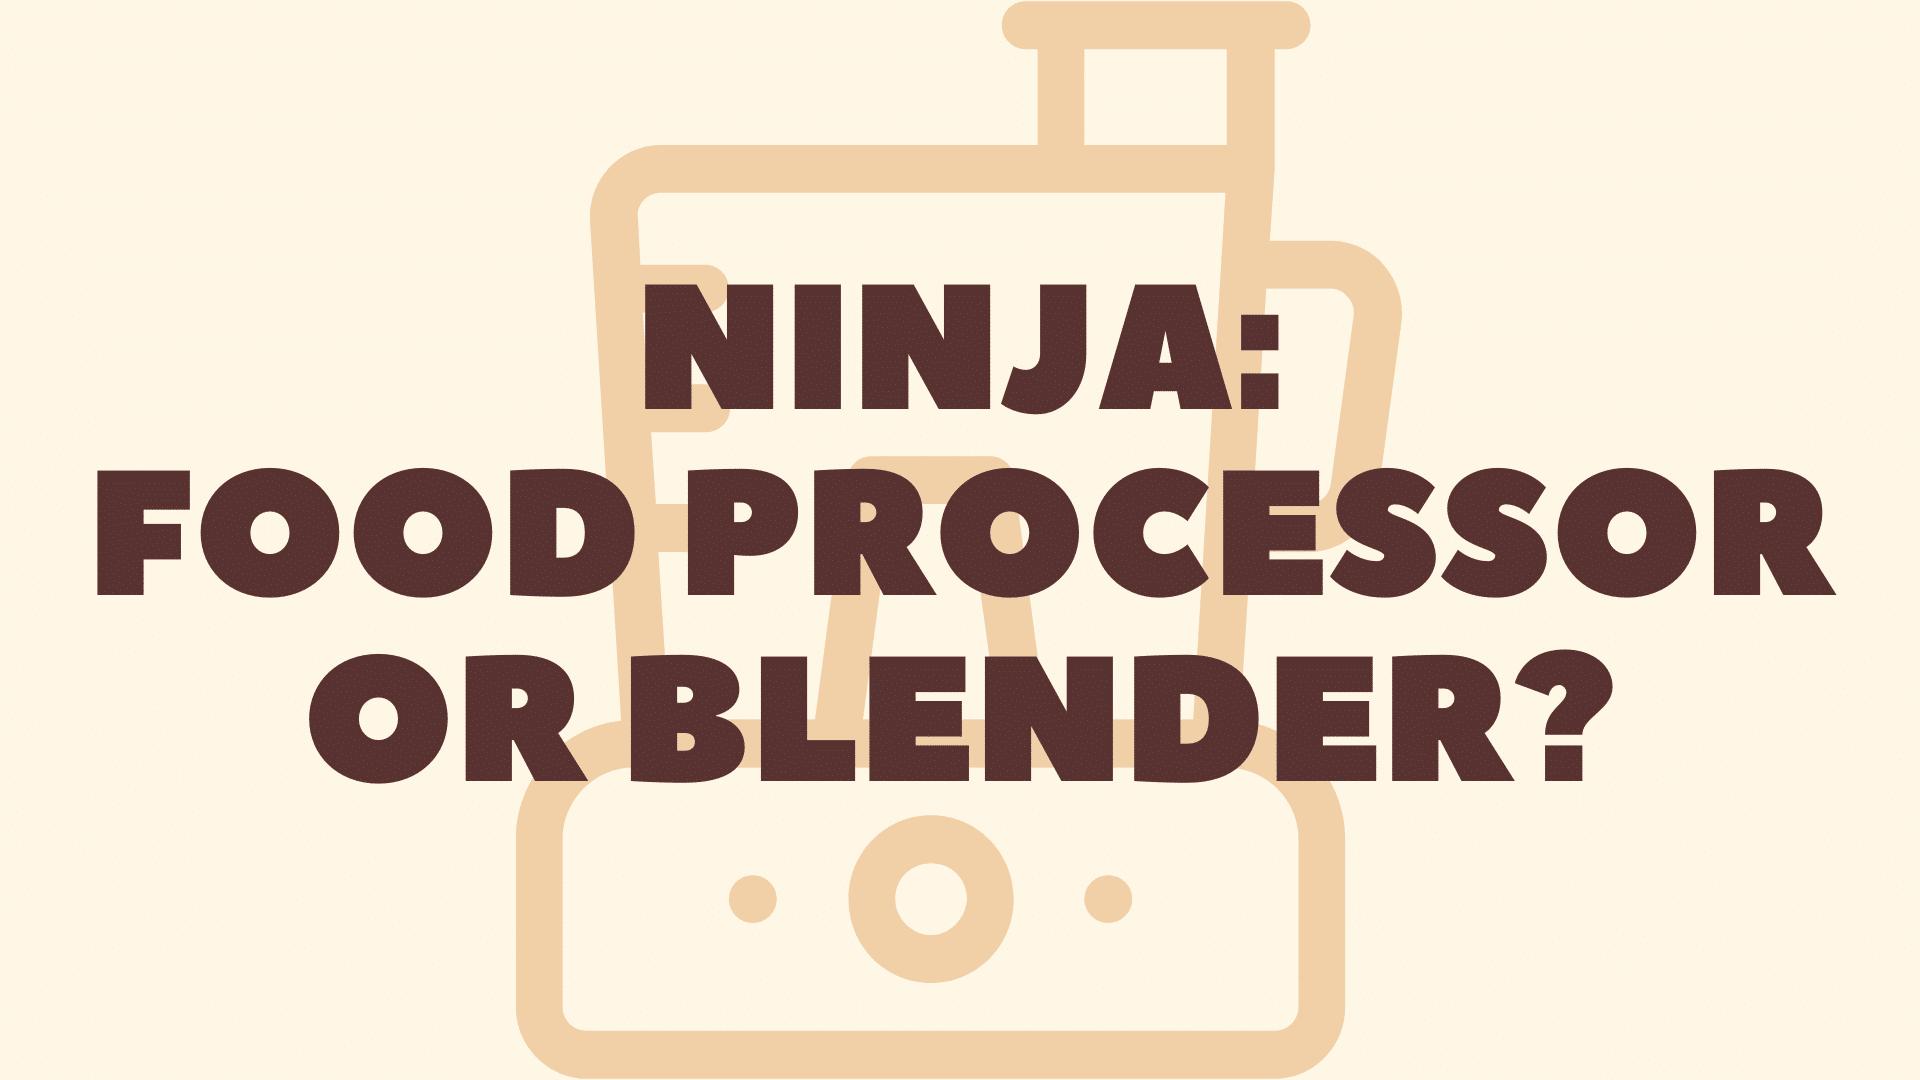 Ninja Food Processor VS Ninja Blender